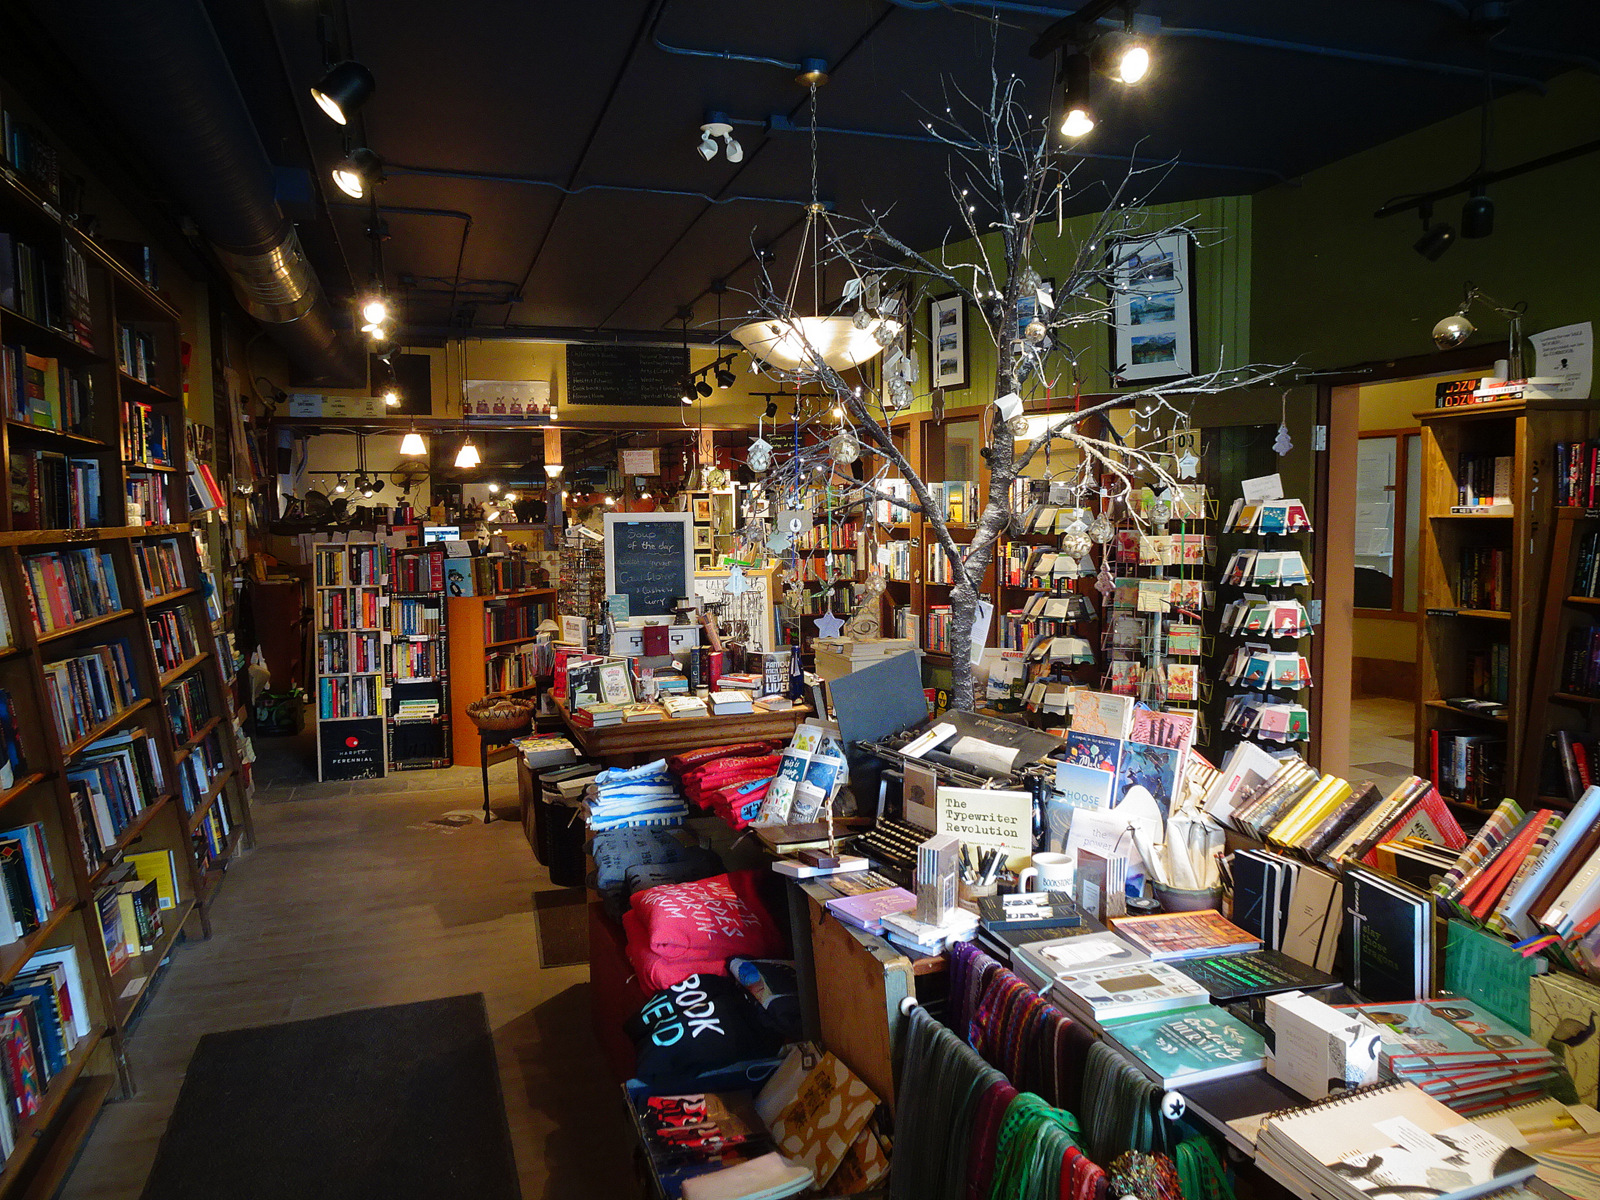 Cafe Books